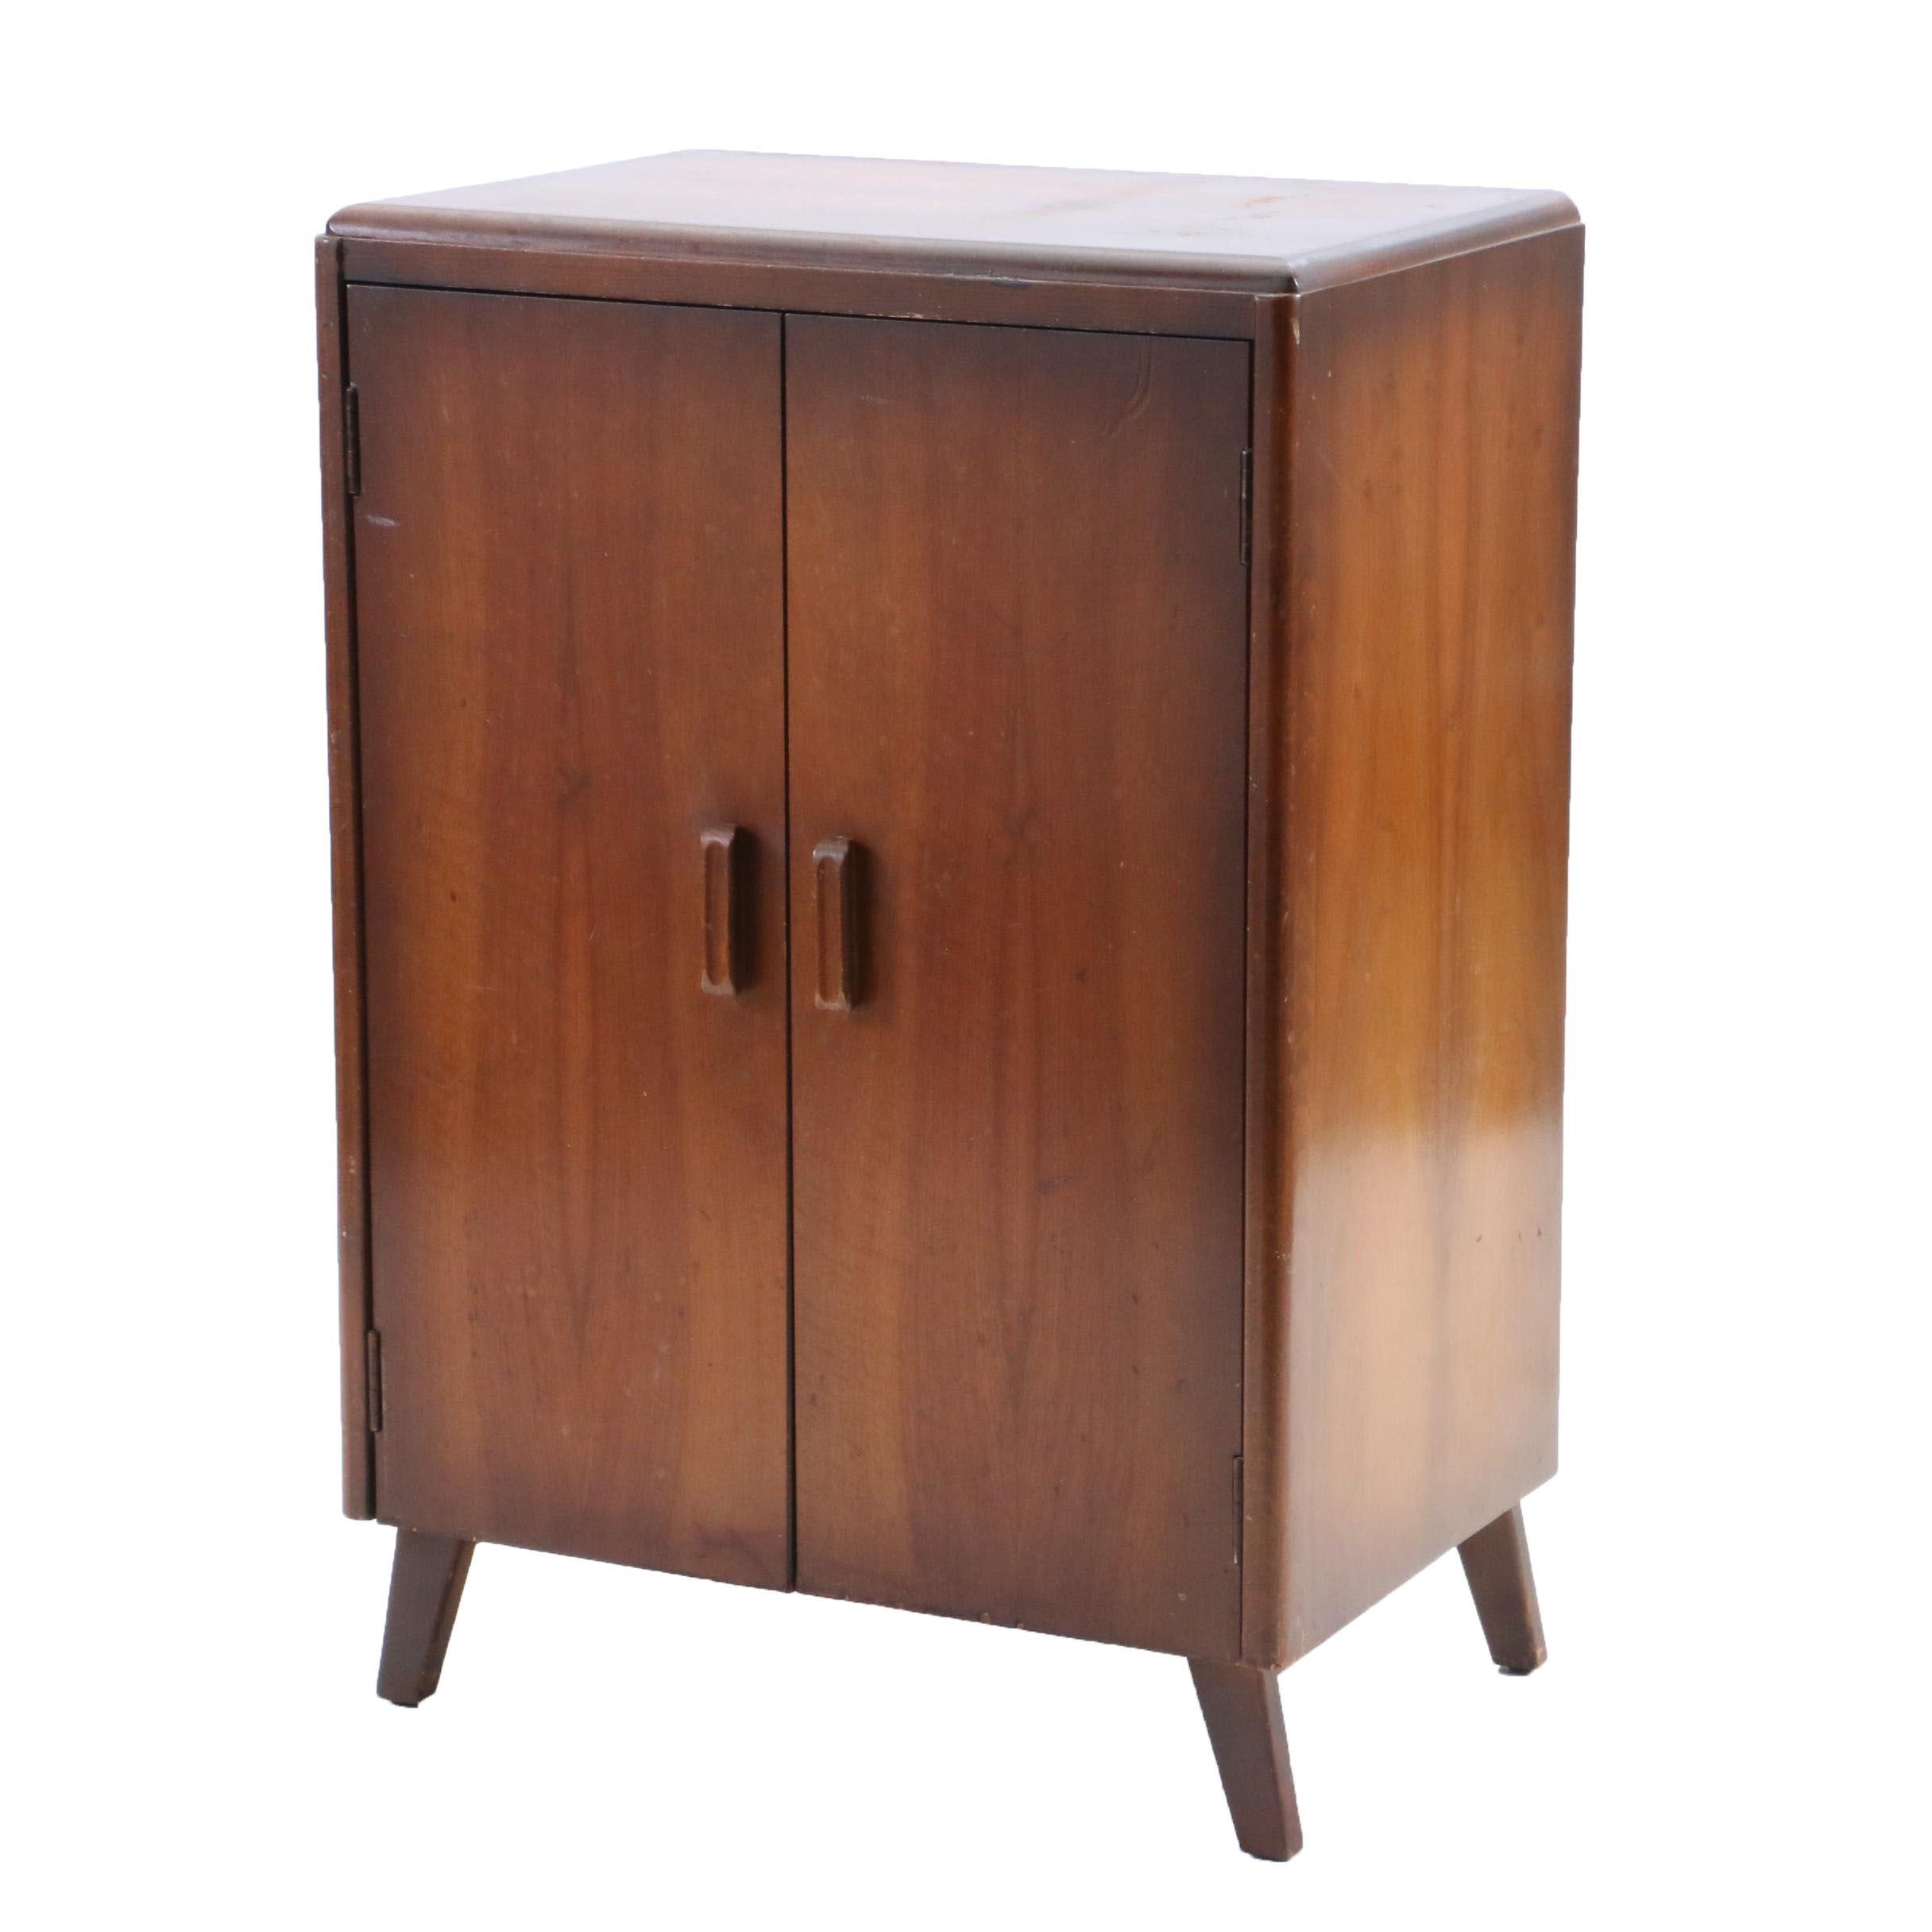 1940s-1950s Walnut Finish Record Storage Cabinet